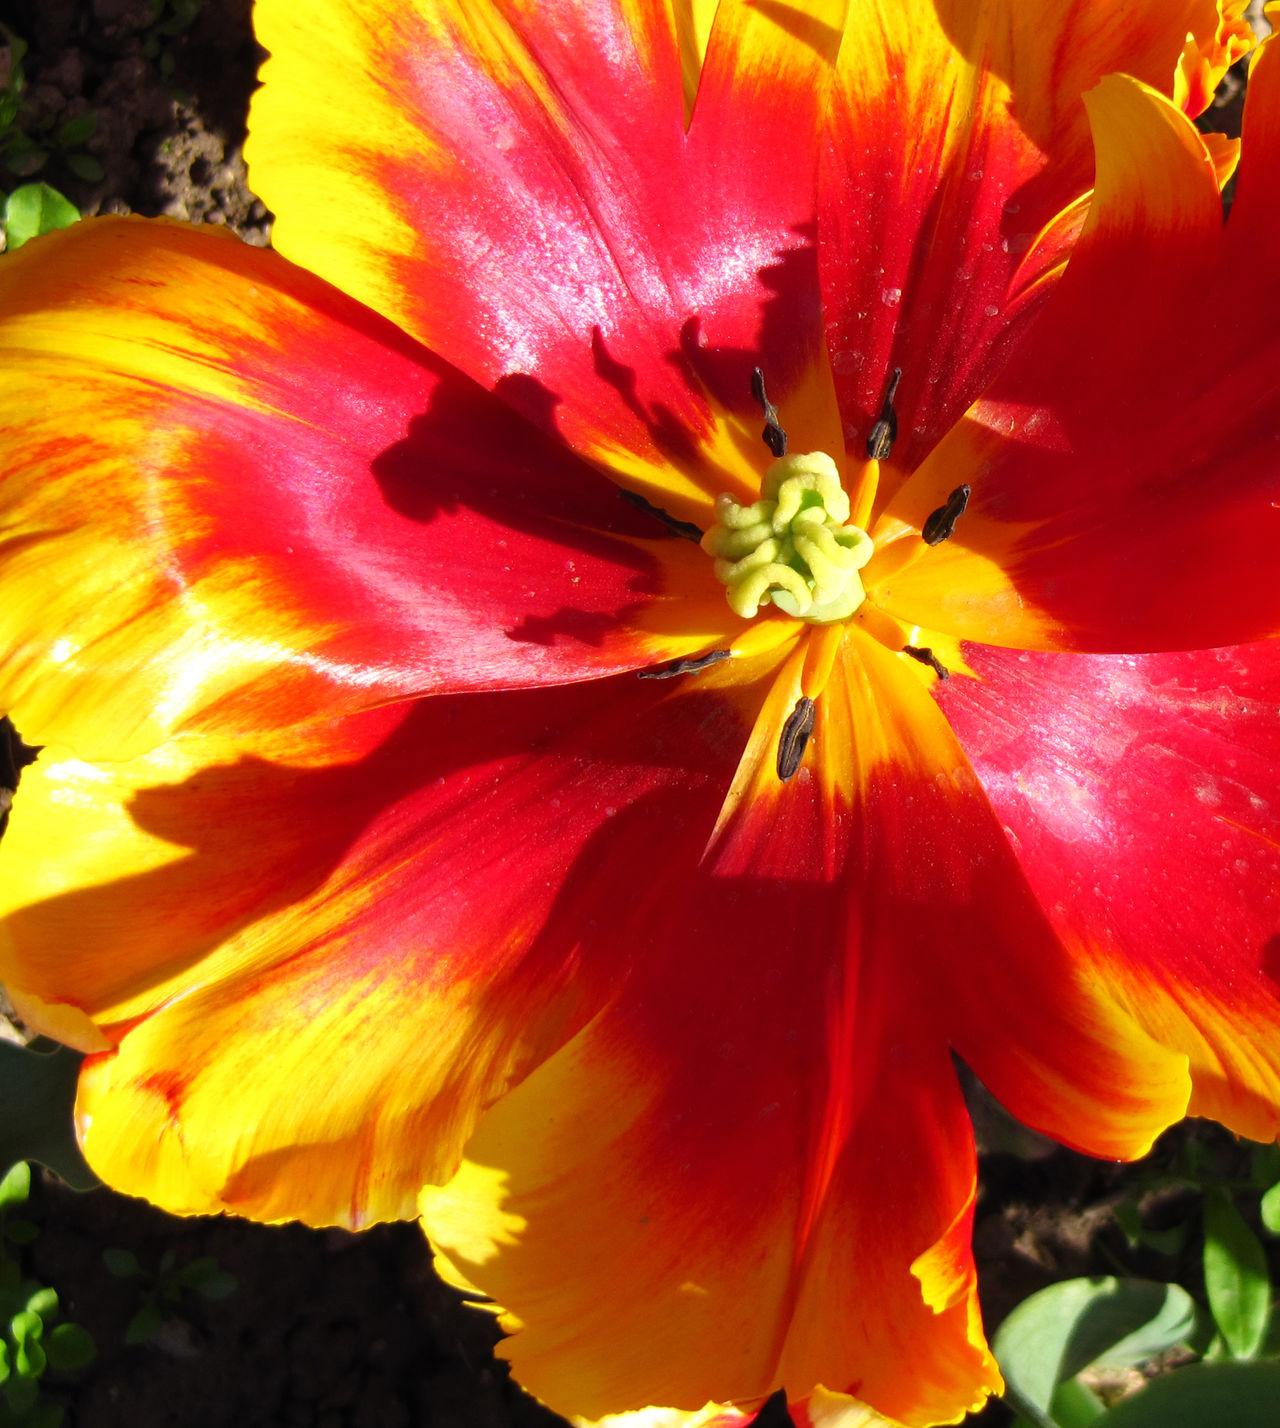 Flower Flower Closeup Pestle Redyellow Tulip Stamen The Core Of The Flower Tulip Blooming Tulip